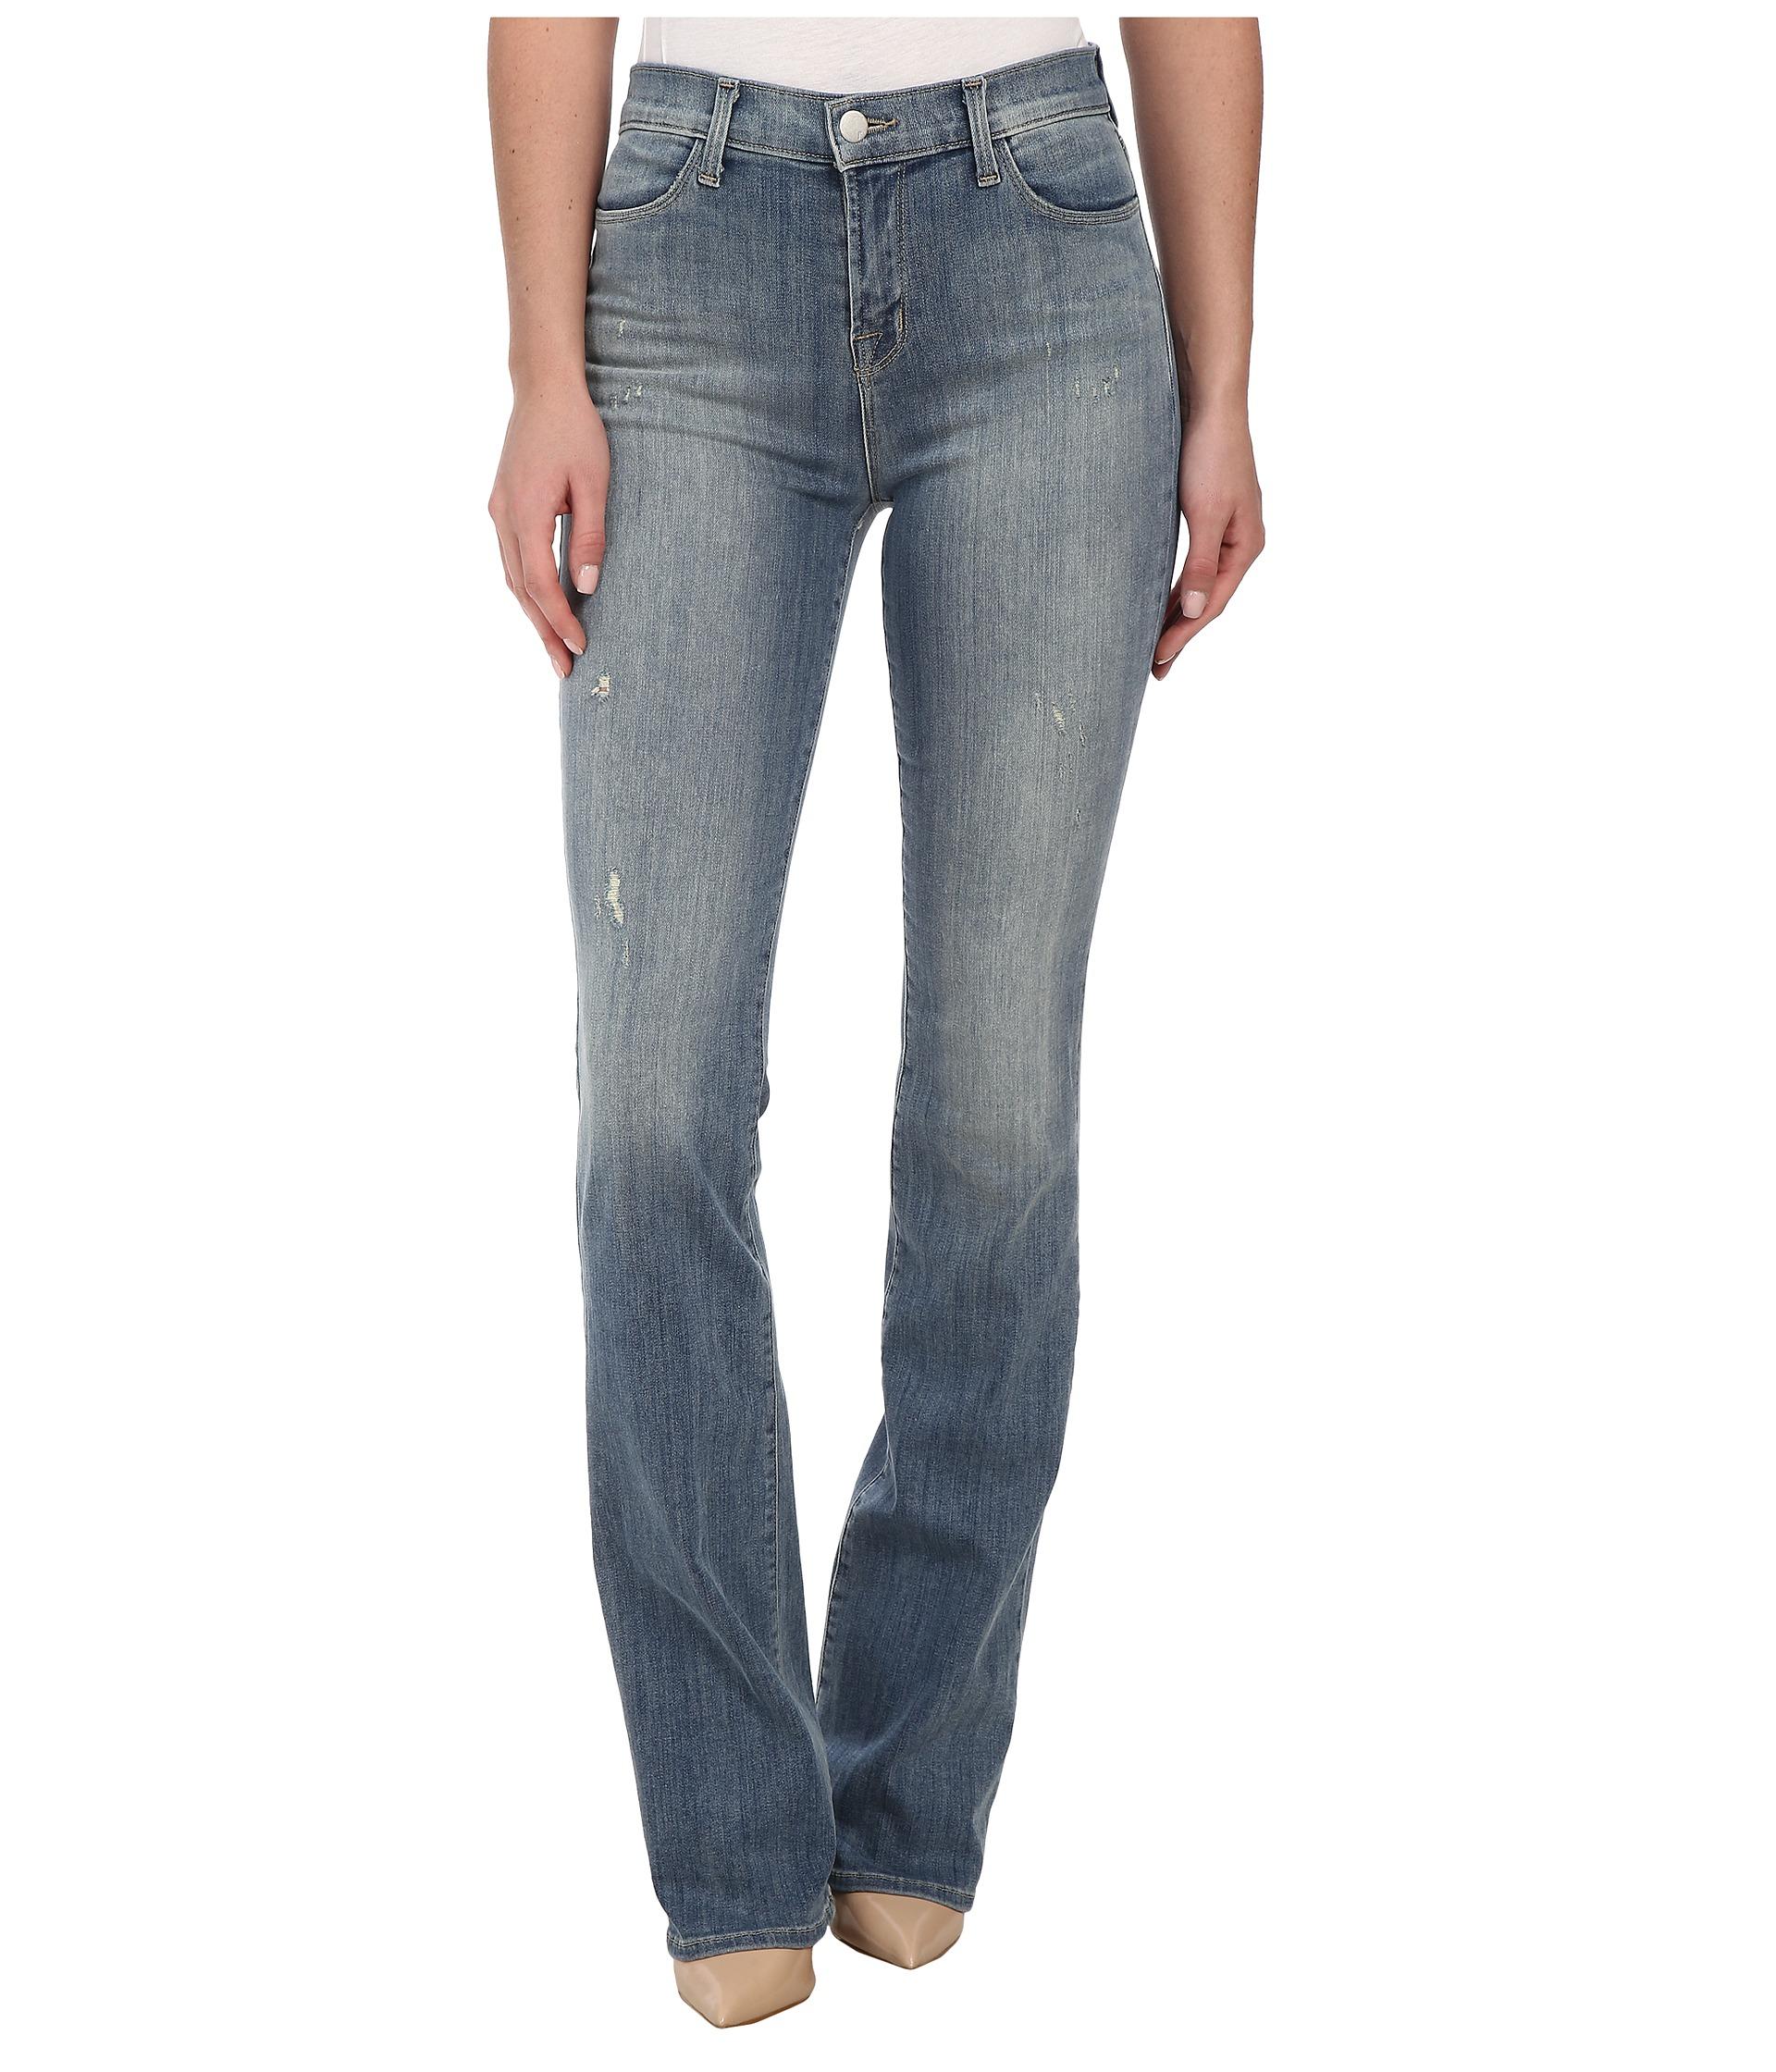 J brand high rise slim boot cut jeans